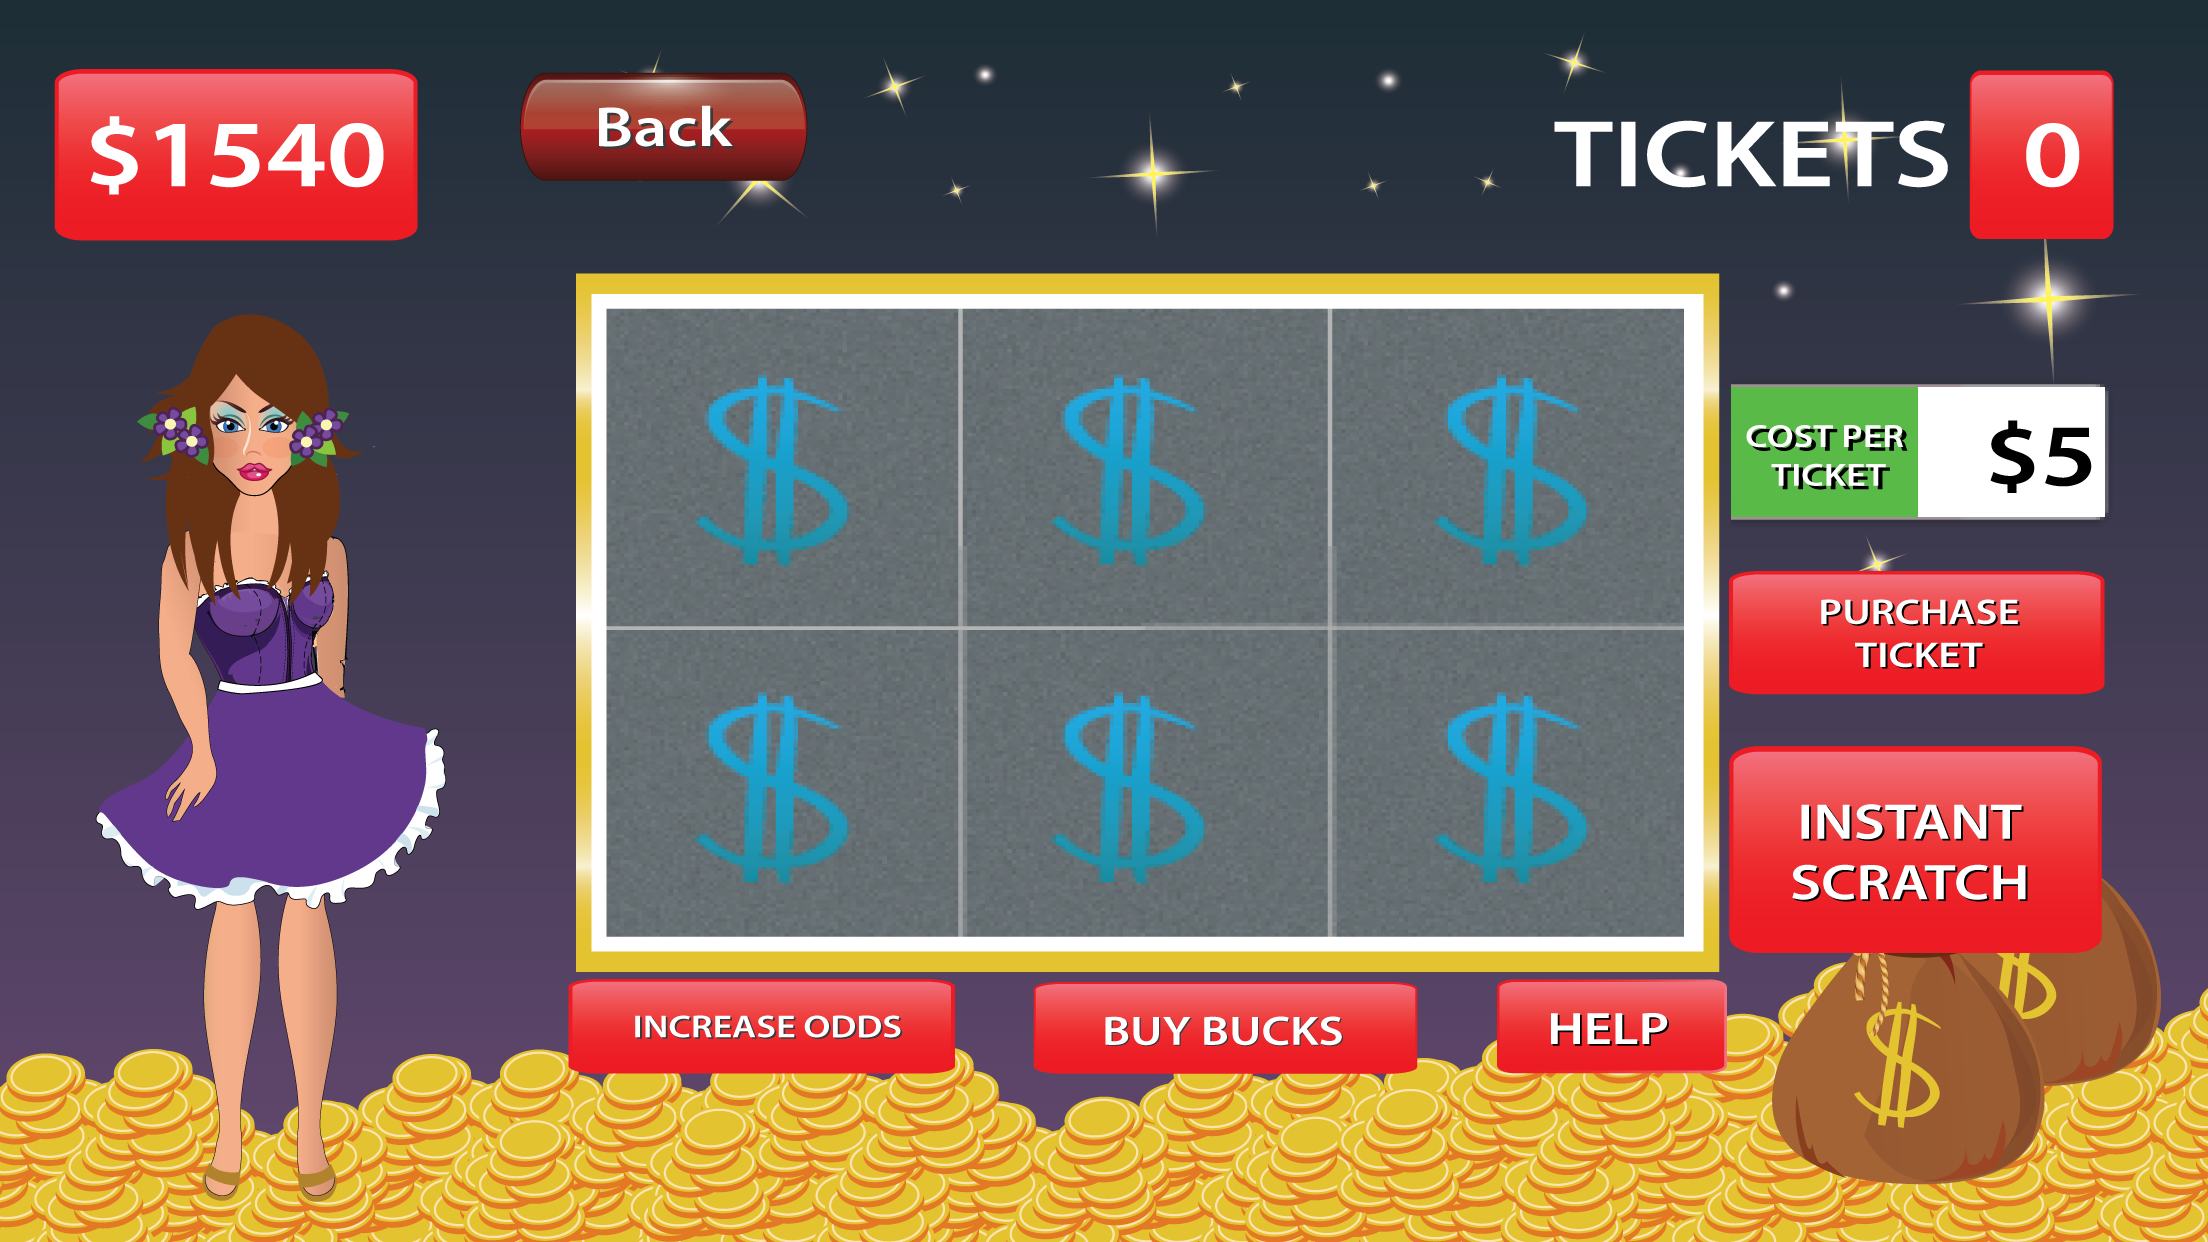 Scratcher Party - Scratch Off the Tickets and Make a Big Win Screenshot